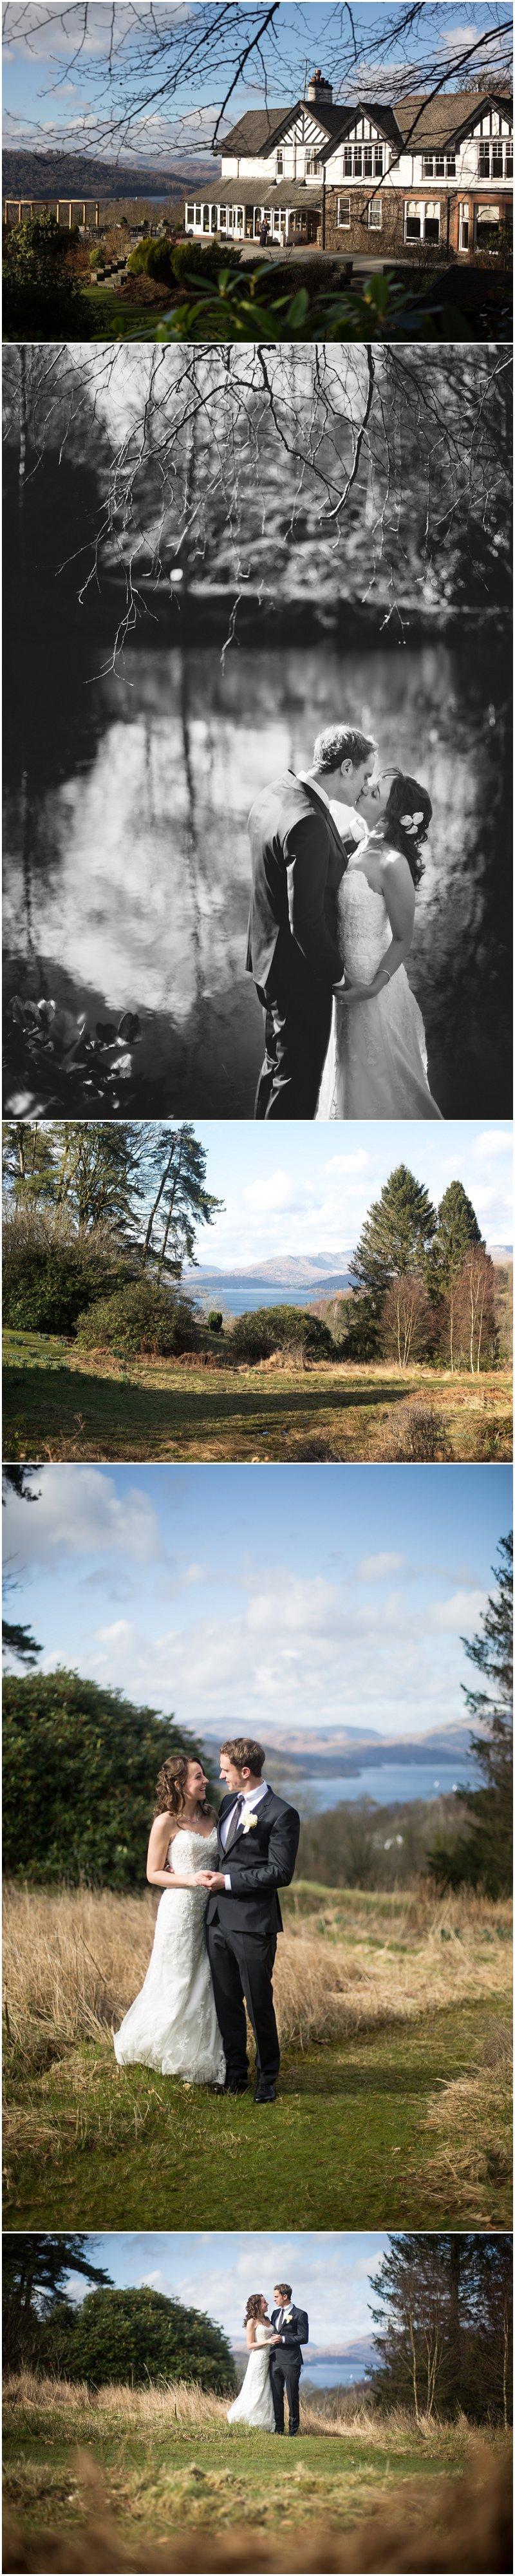 Bride and Groom portraits overlooking Windermere Cumbria